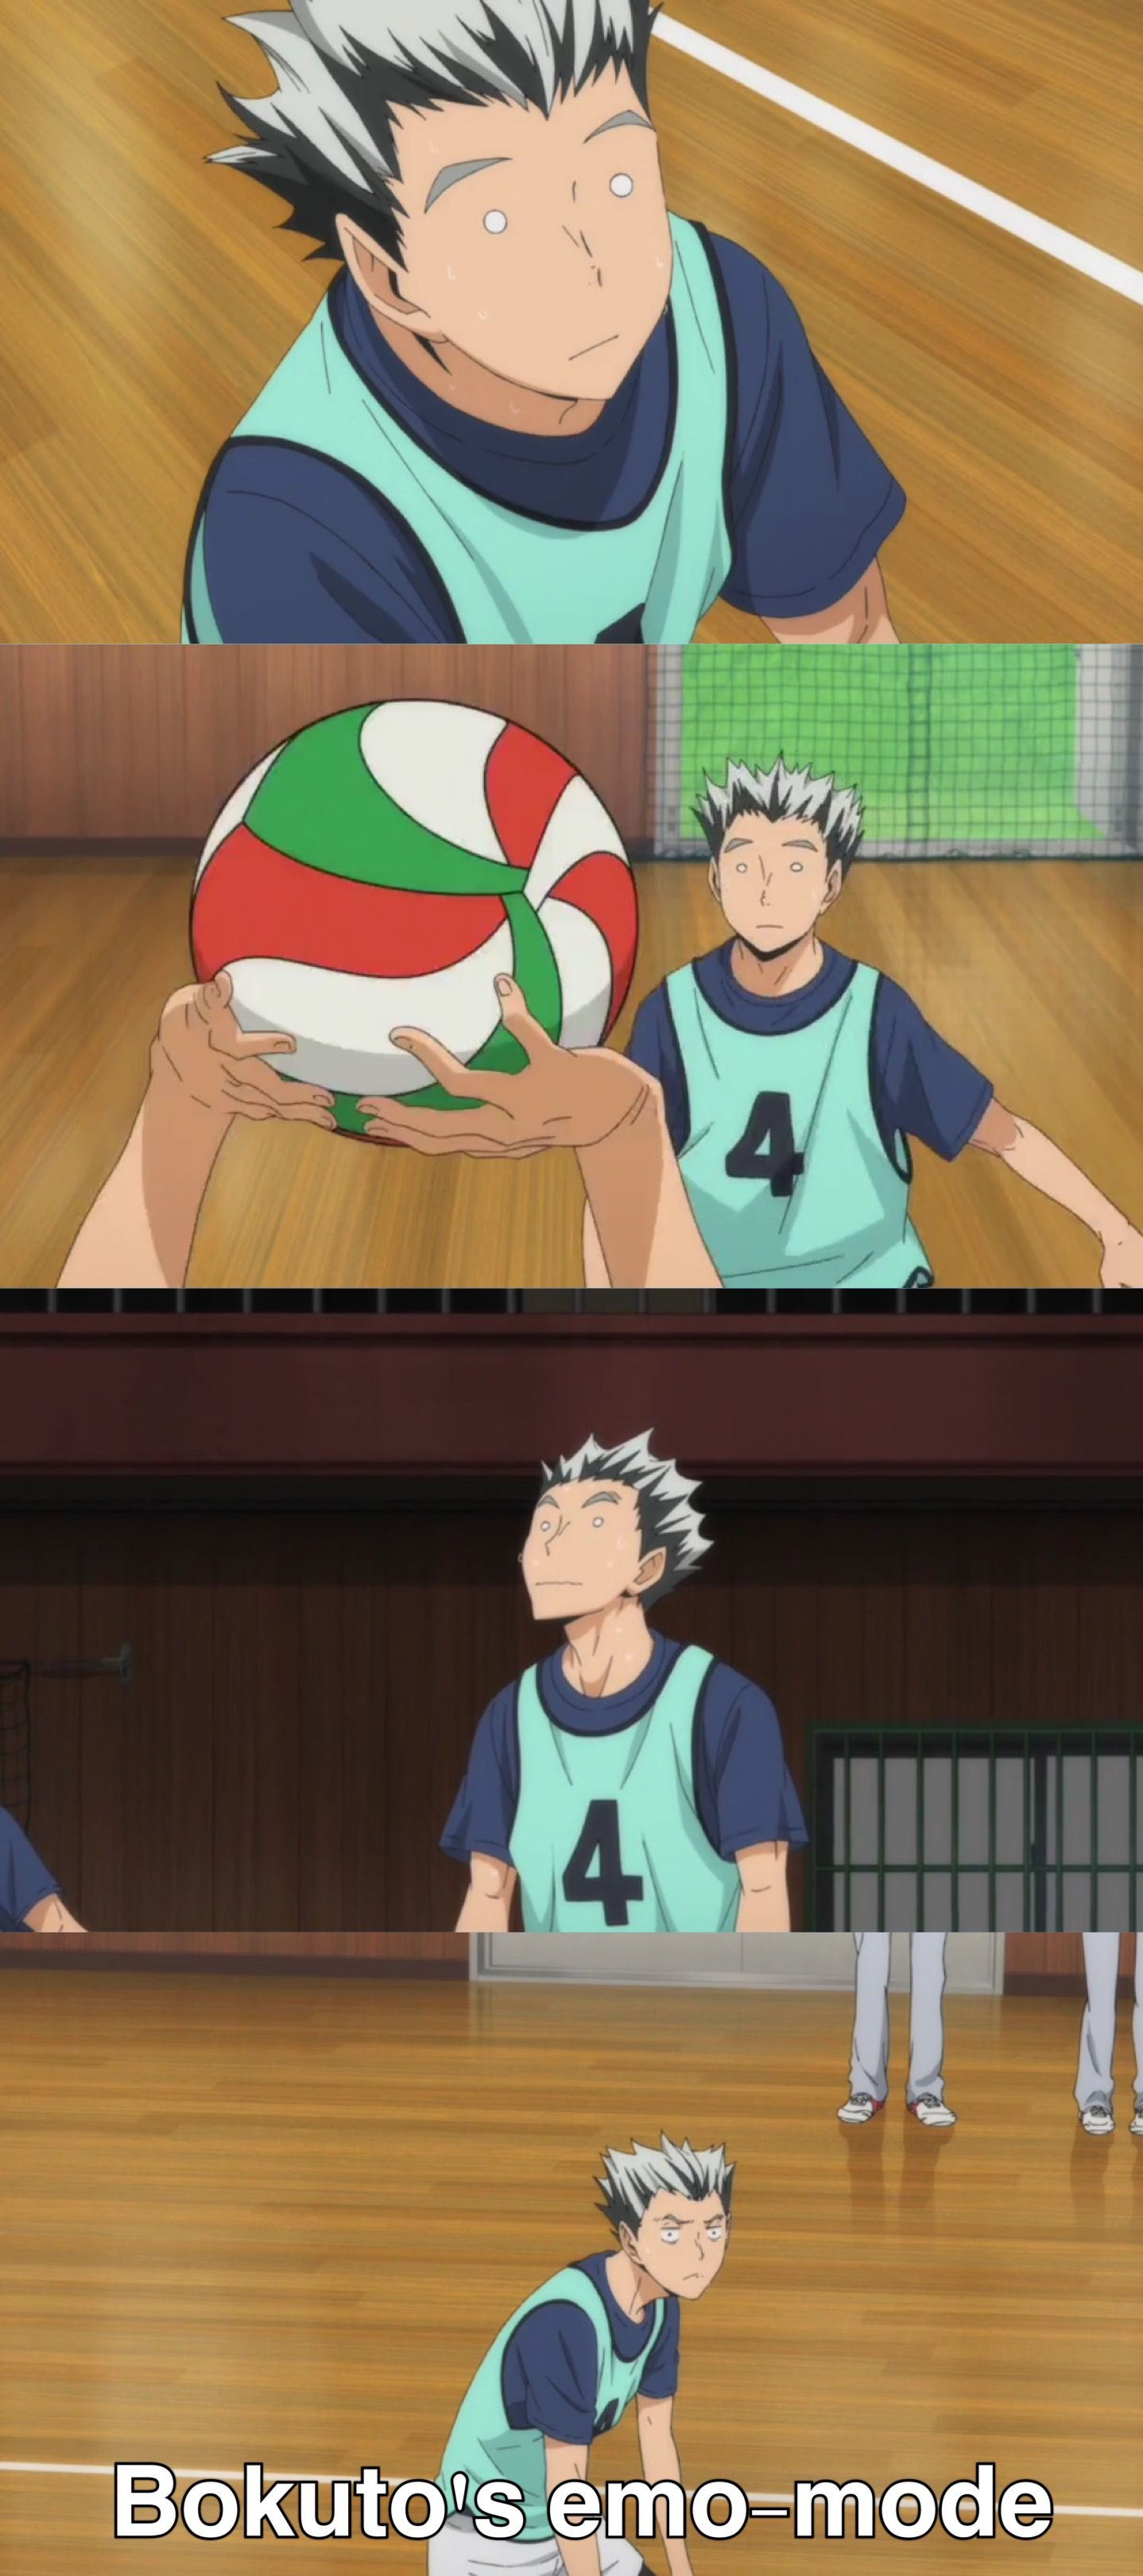 Bokuto Lemme Get A Spike In Why Aren T You Spiking To Me Team Because You Re In Emo Mode Bokuto Koutaro Bokuto Koutarou Haikyuu Anime